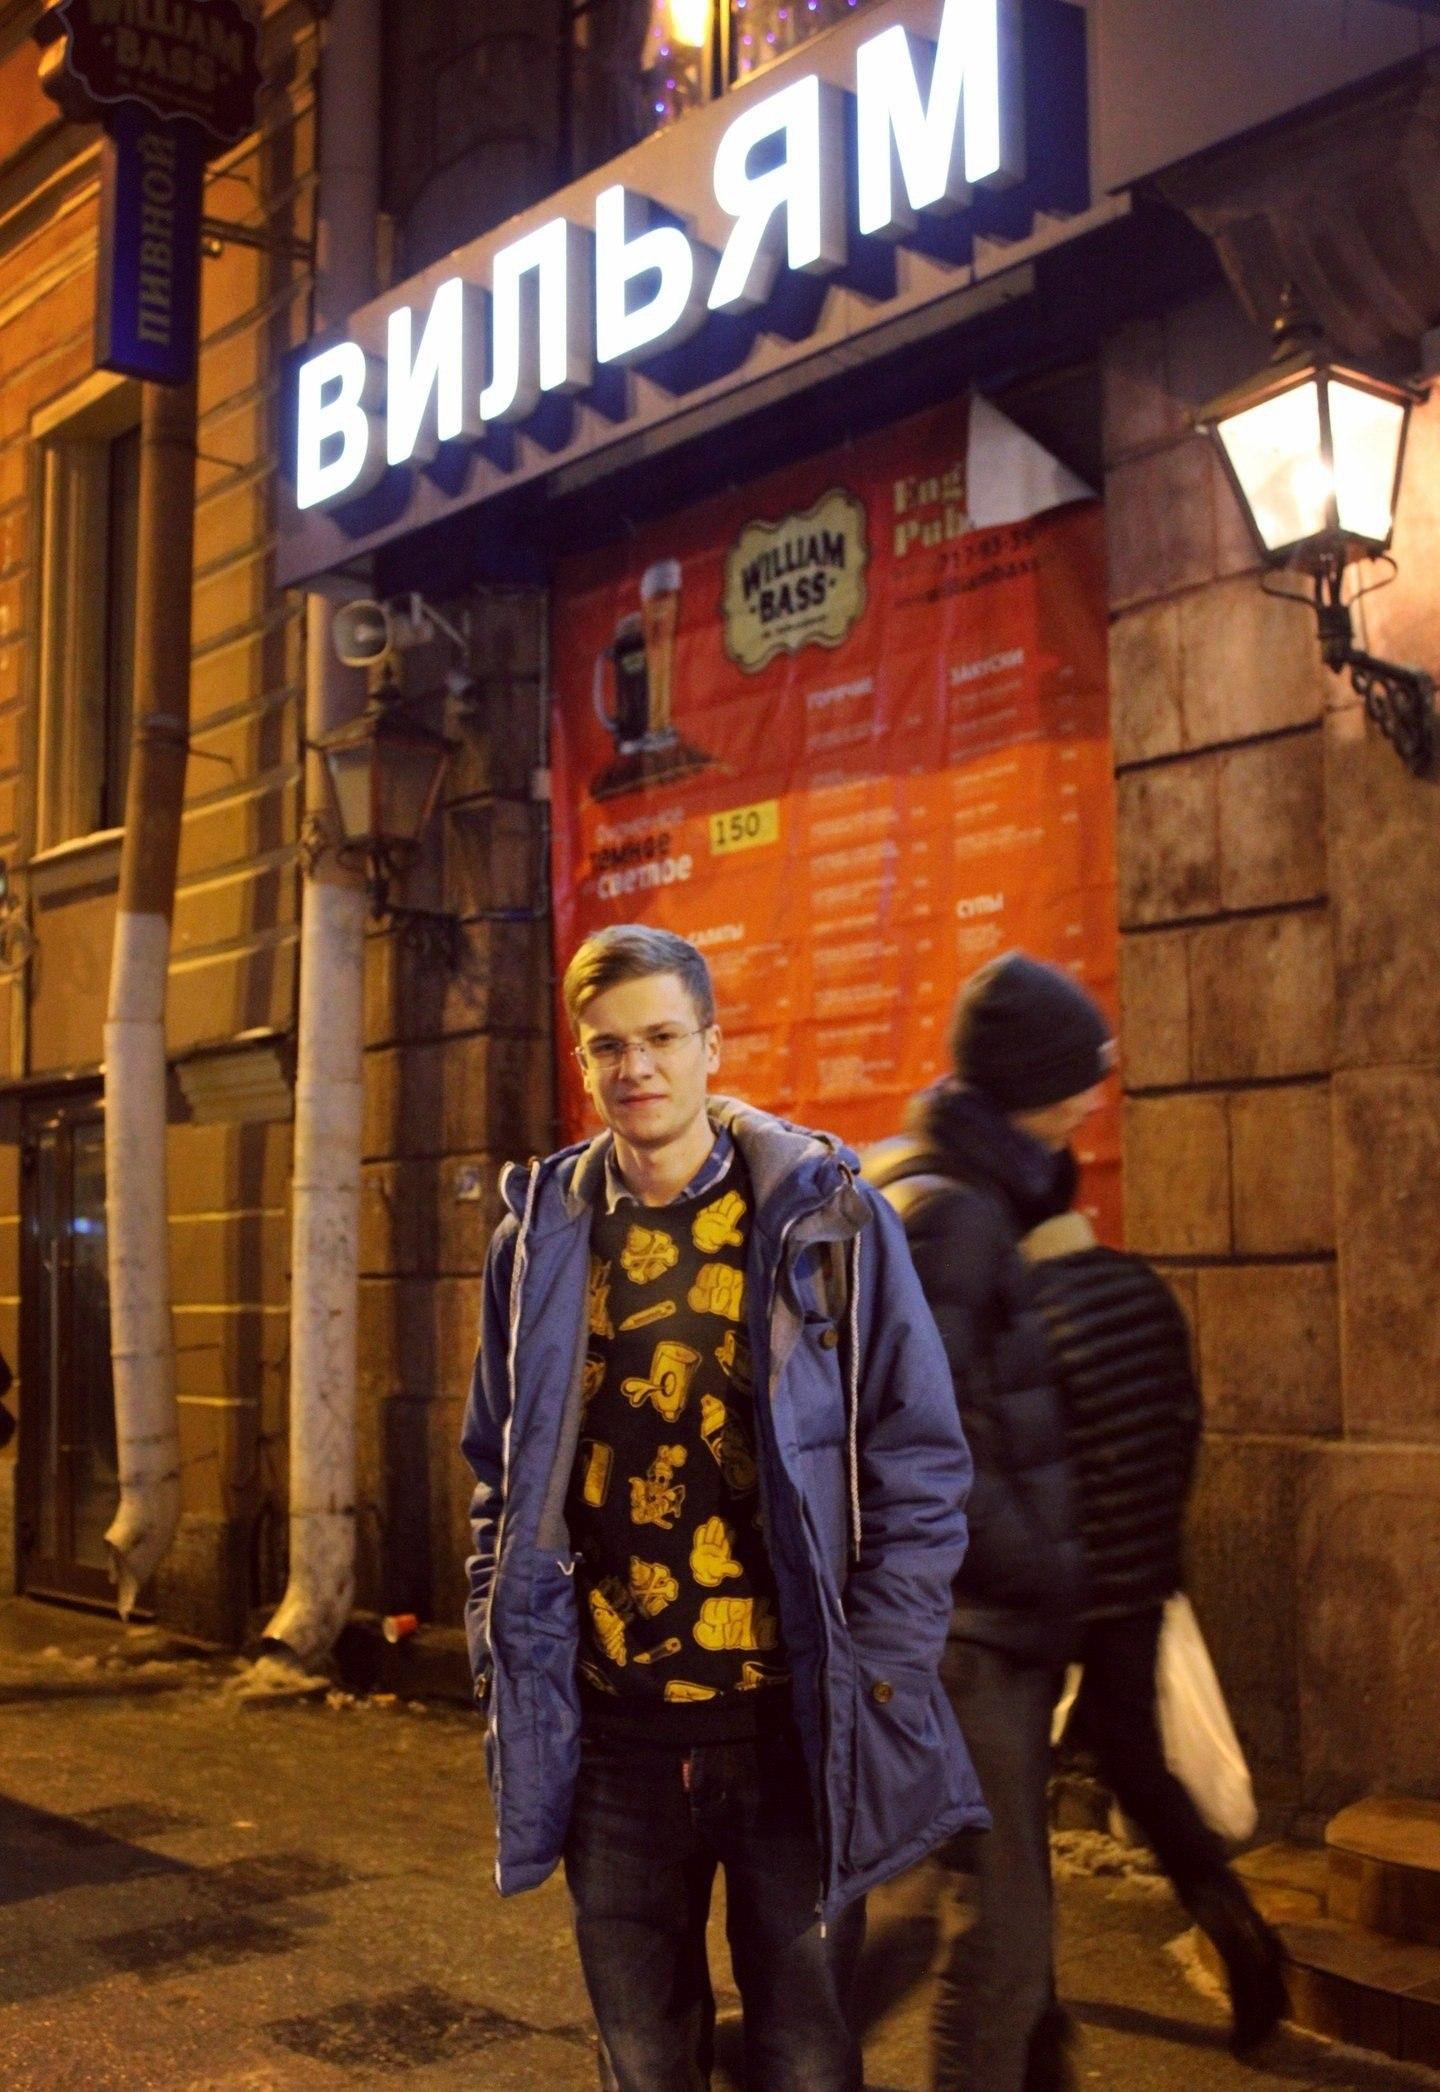 Вильям Бруно и Кирил [Пранки]. Биография. Личная жизнь. Фото, фанфики